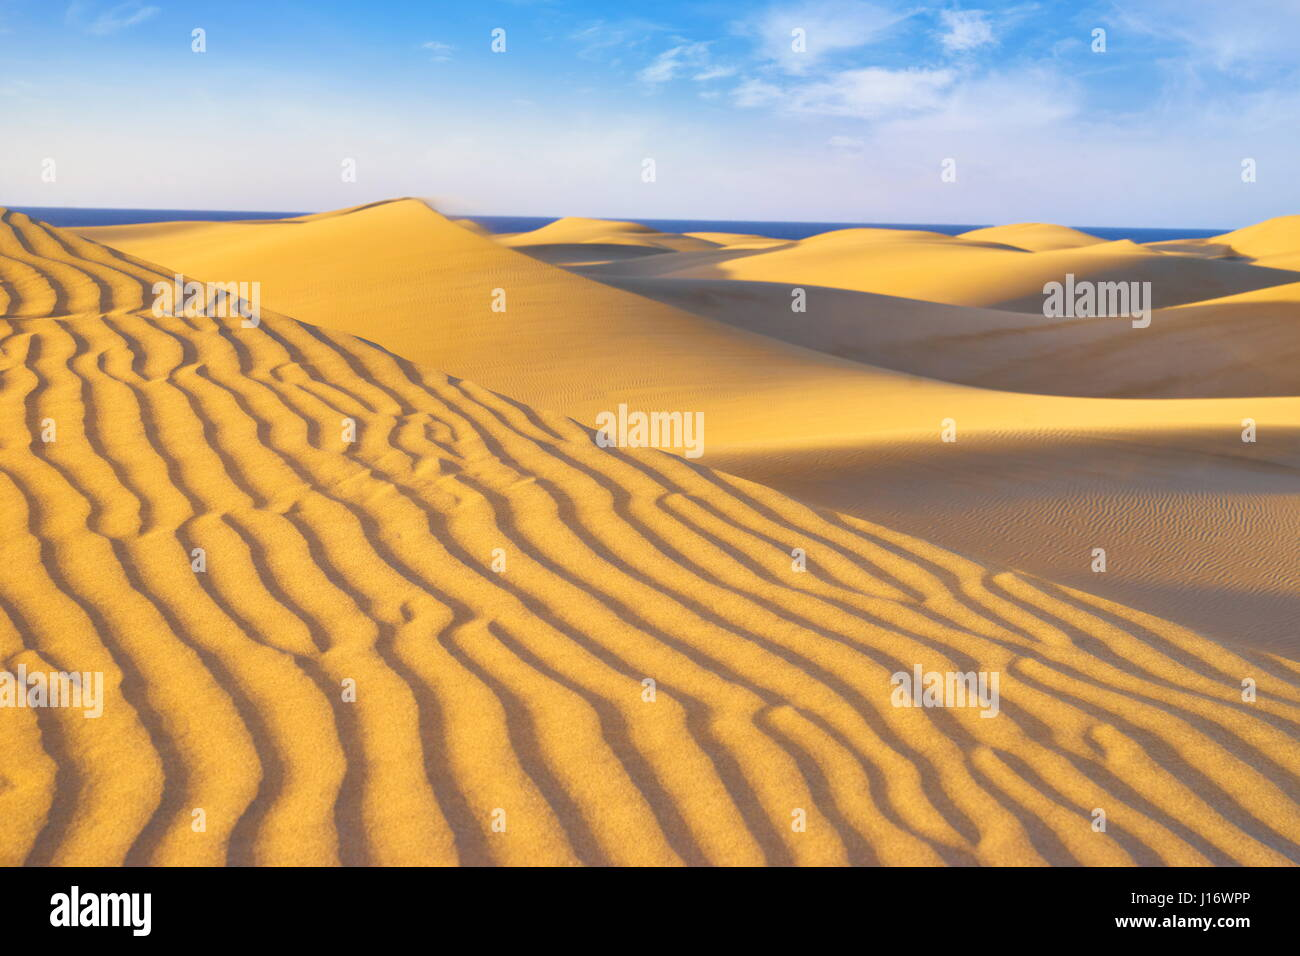 Kanarische Inseln, Gran Canaria, Playa del Ingles, Maspalomas Sand Dunes National Park, Spanien Stockbild